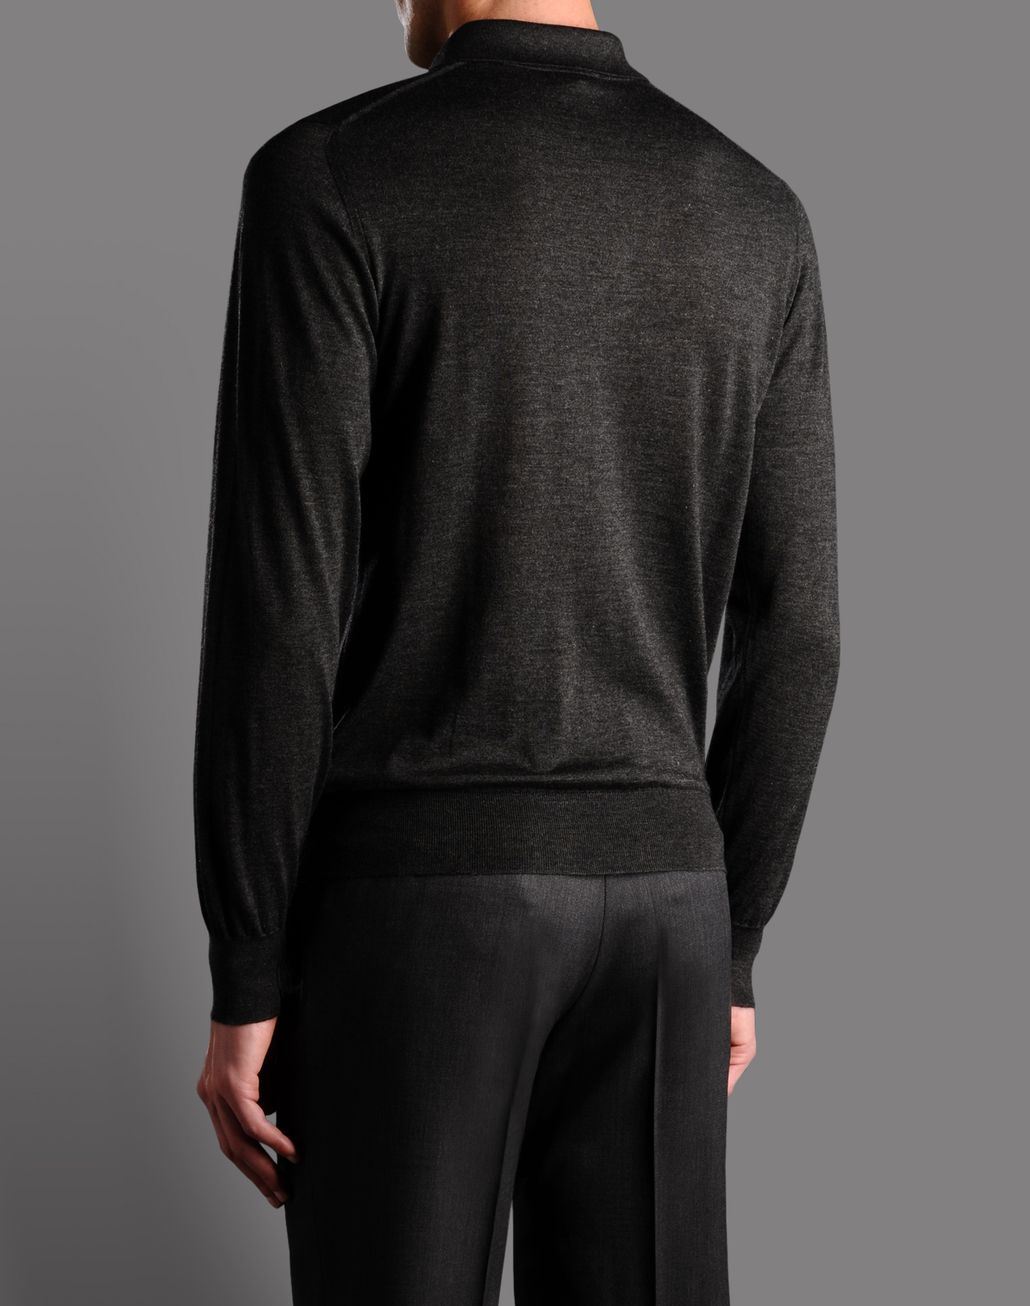 BRIONI POLO SHIRT Knitwear U r